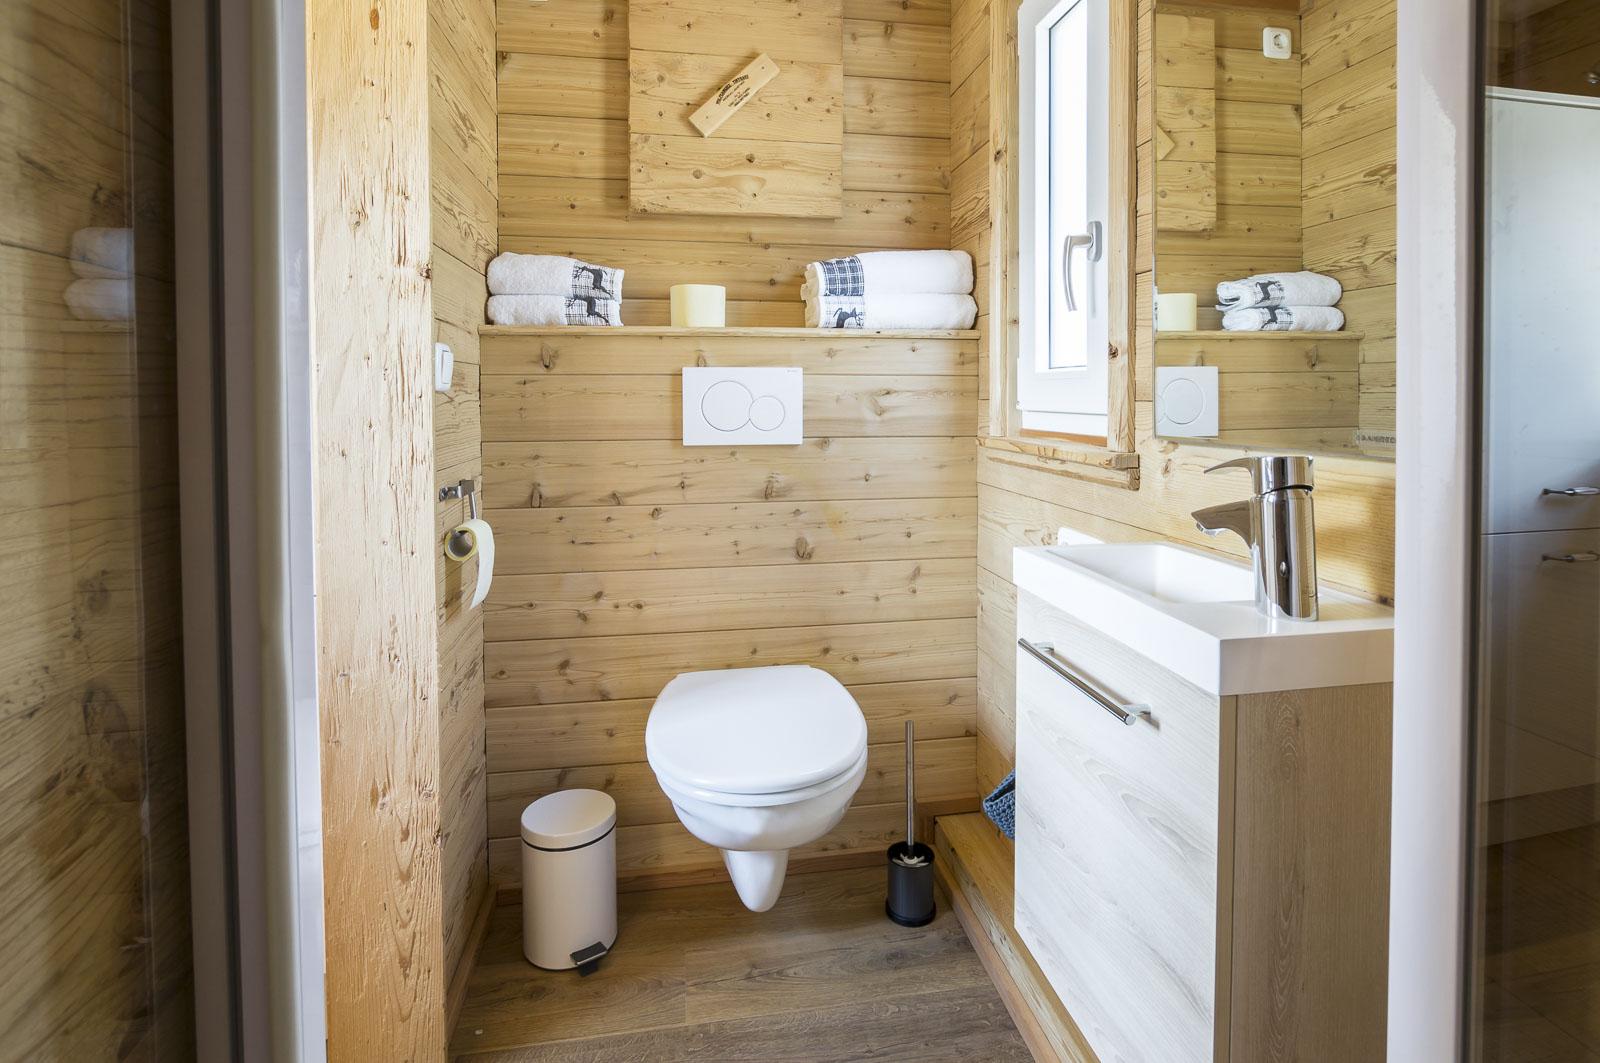 ...WC...